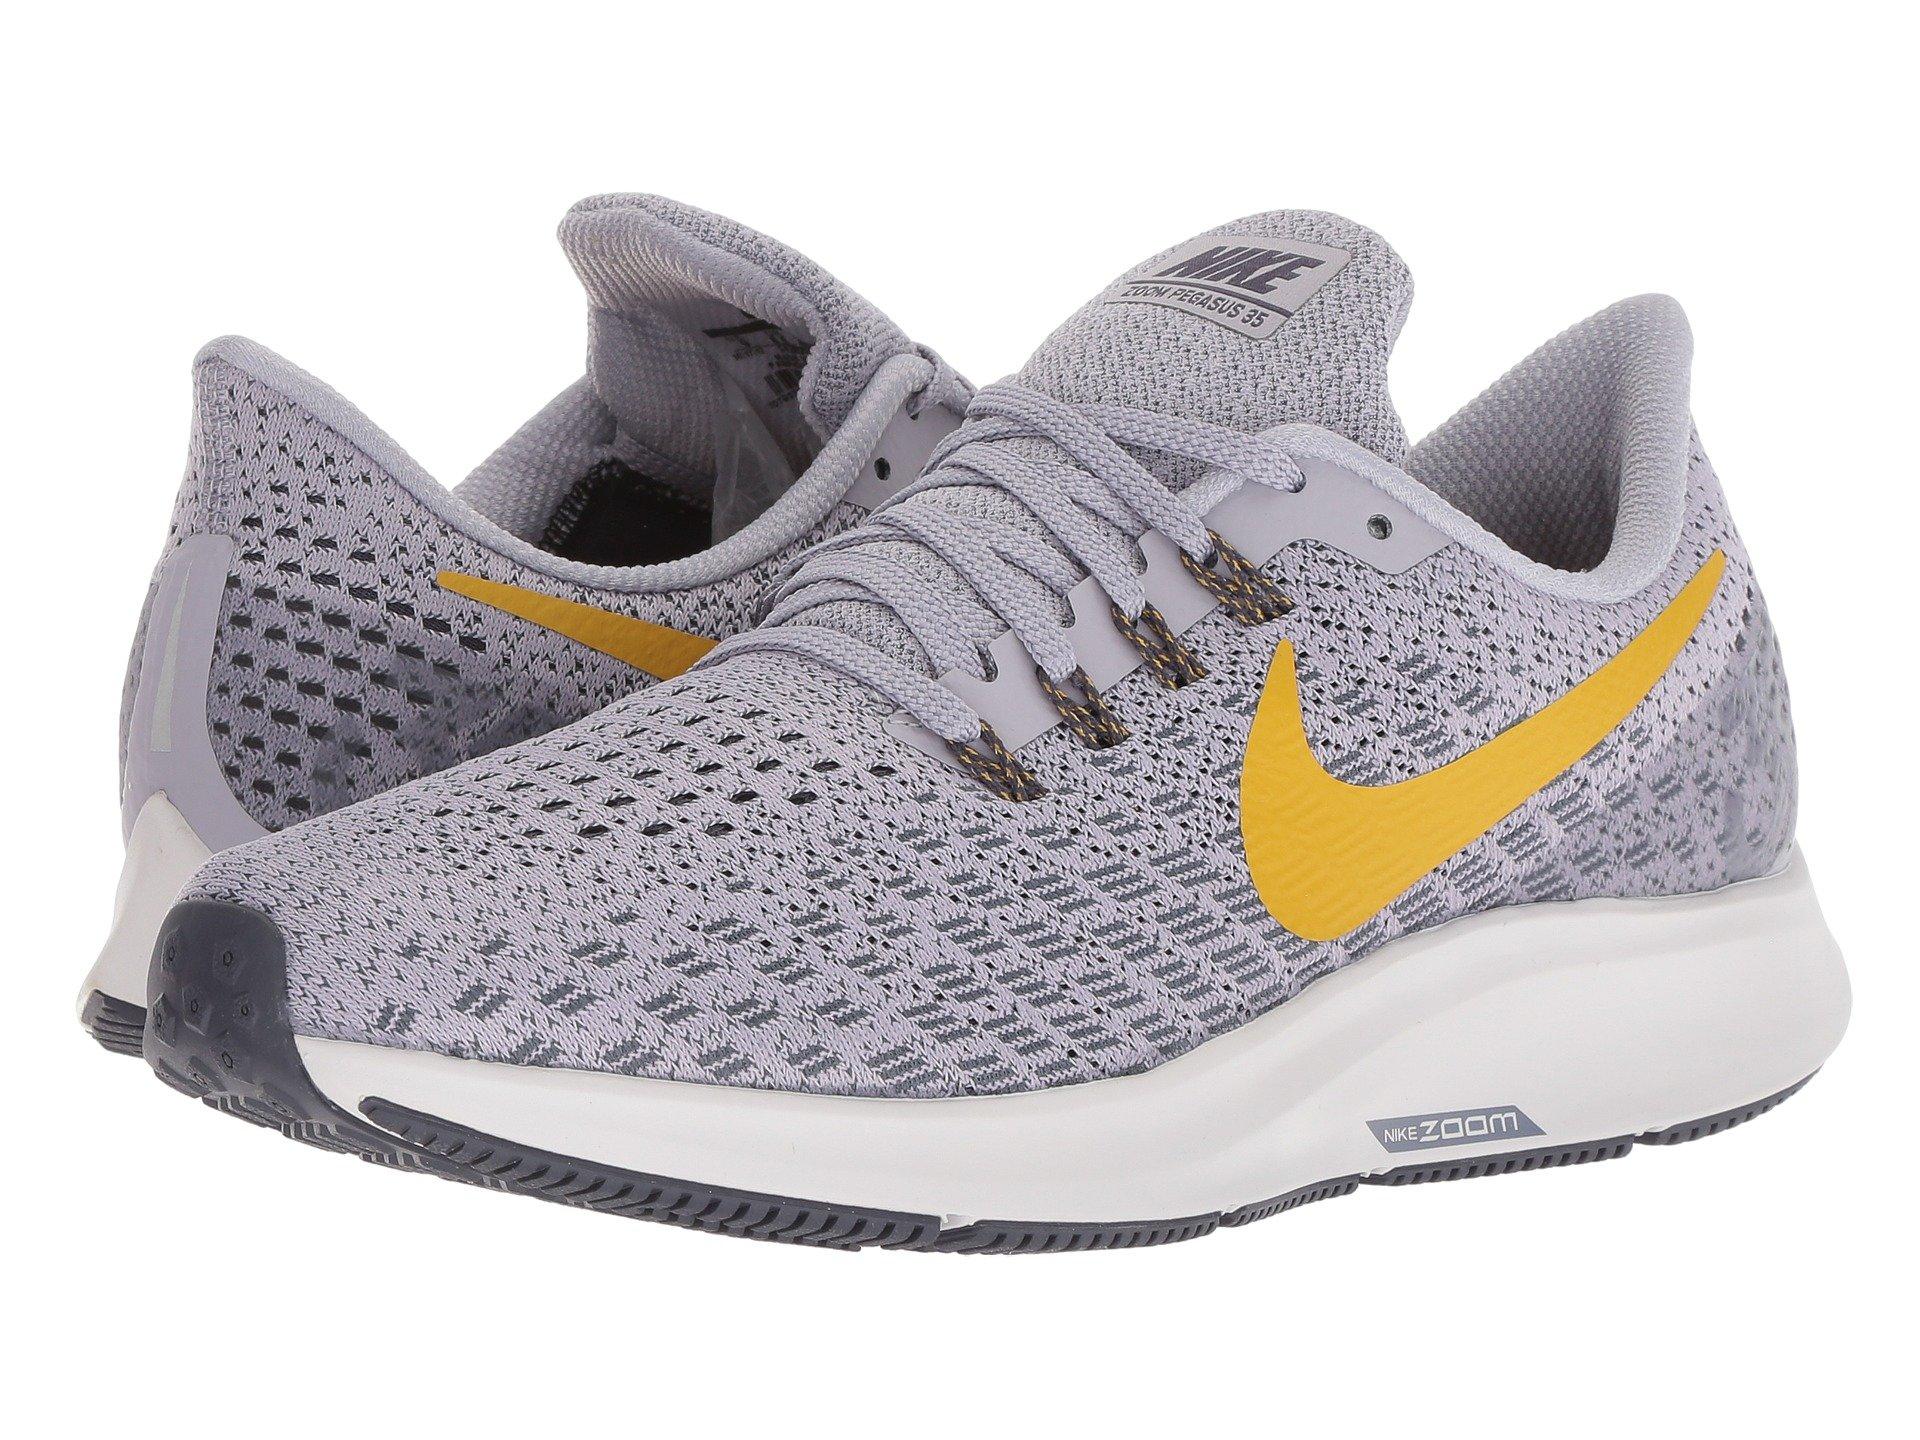 Nike WMNS Air Zoom Pegasus 35 Womens 942855-500 Size 5 by Nike (Image #7)